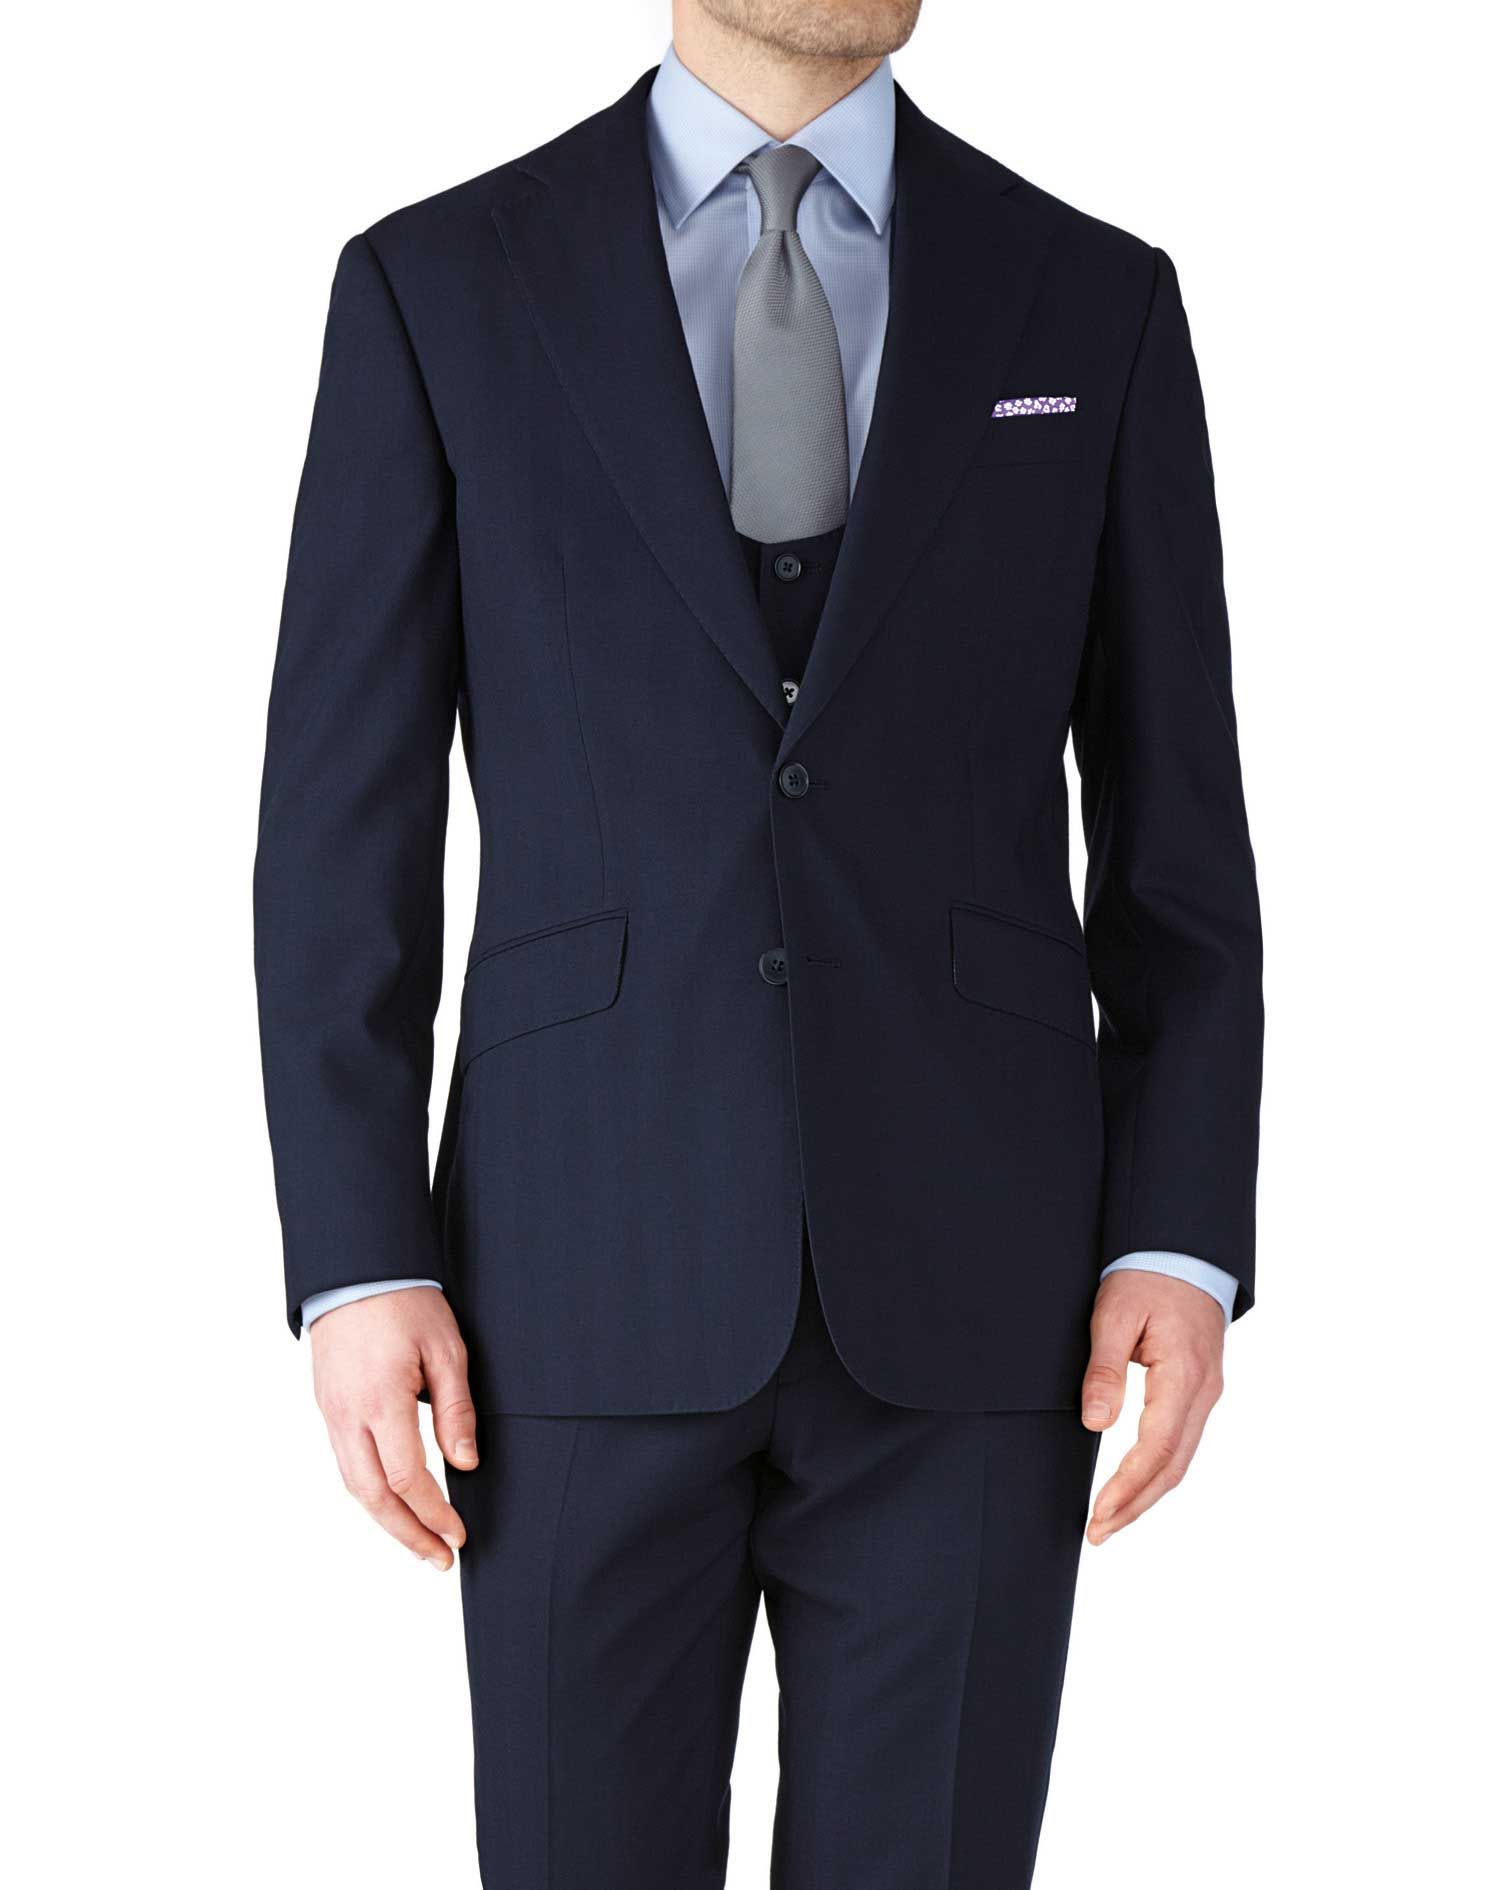 Navy Slim Fit Herringbone Business Suit Wool Jacket Size 42 Short by Charles Tyrwhitt